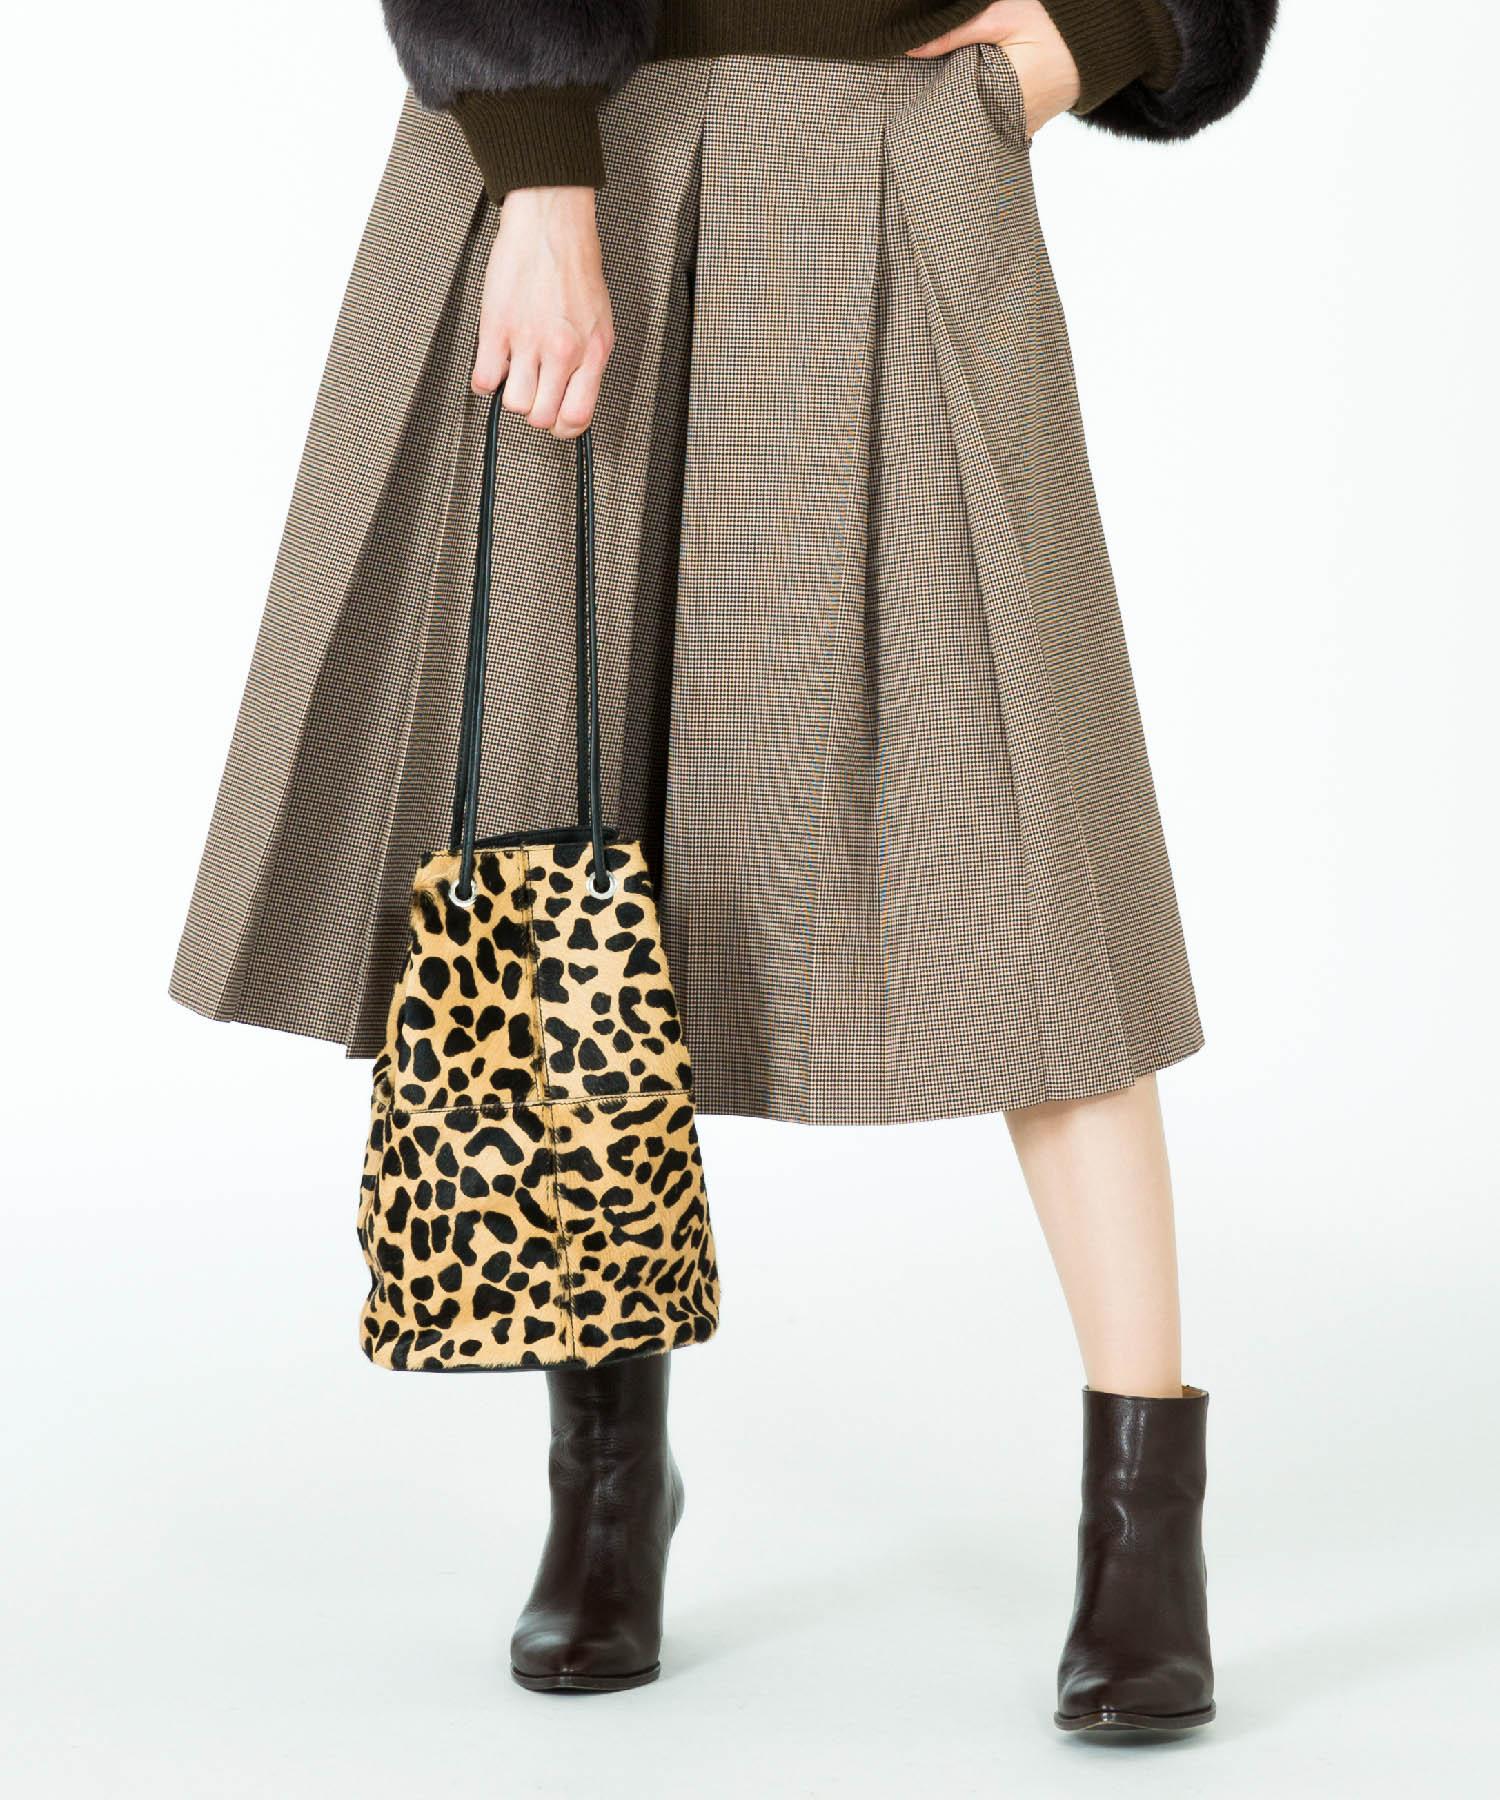 【MARCO MASI per allureville】 ヘアカーフ巾着ショルダーバッグ